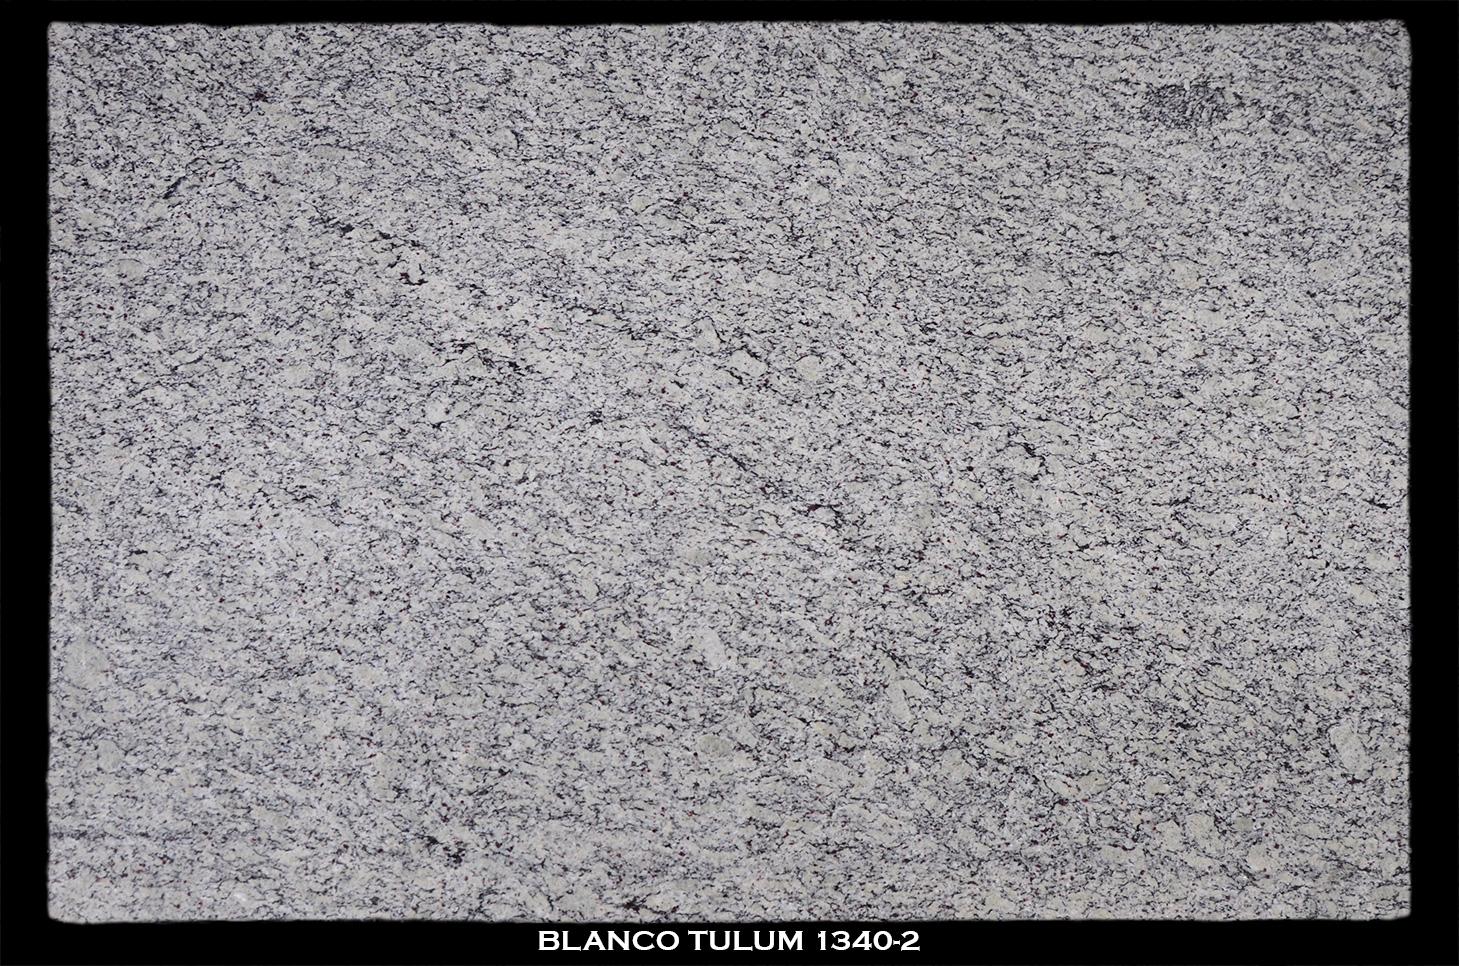 BLANCO-TULUM-1340-2